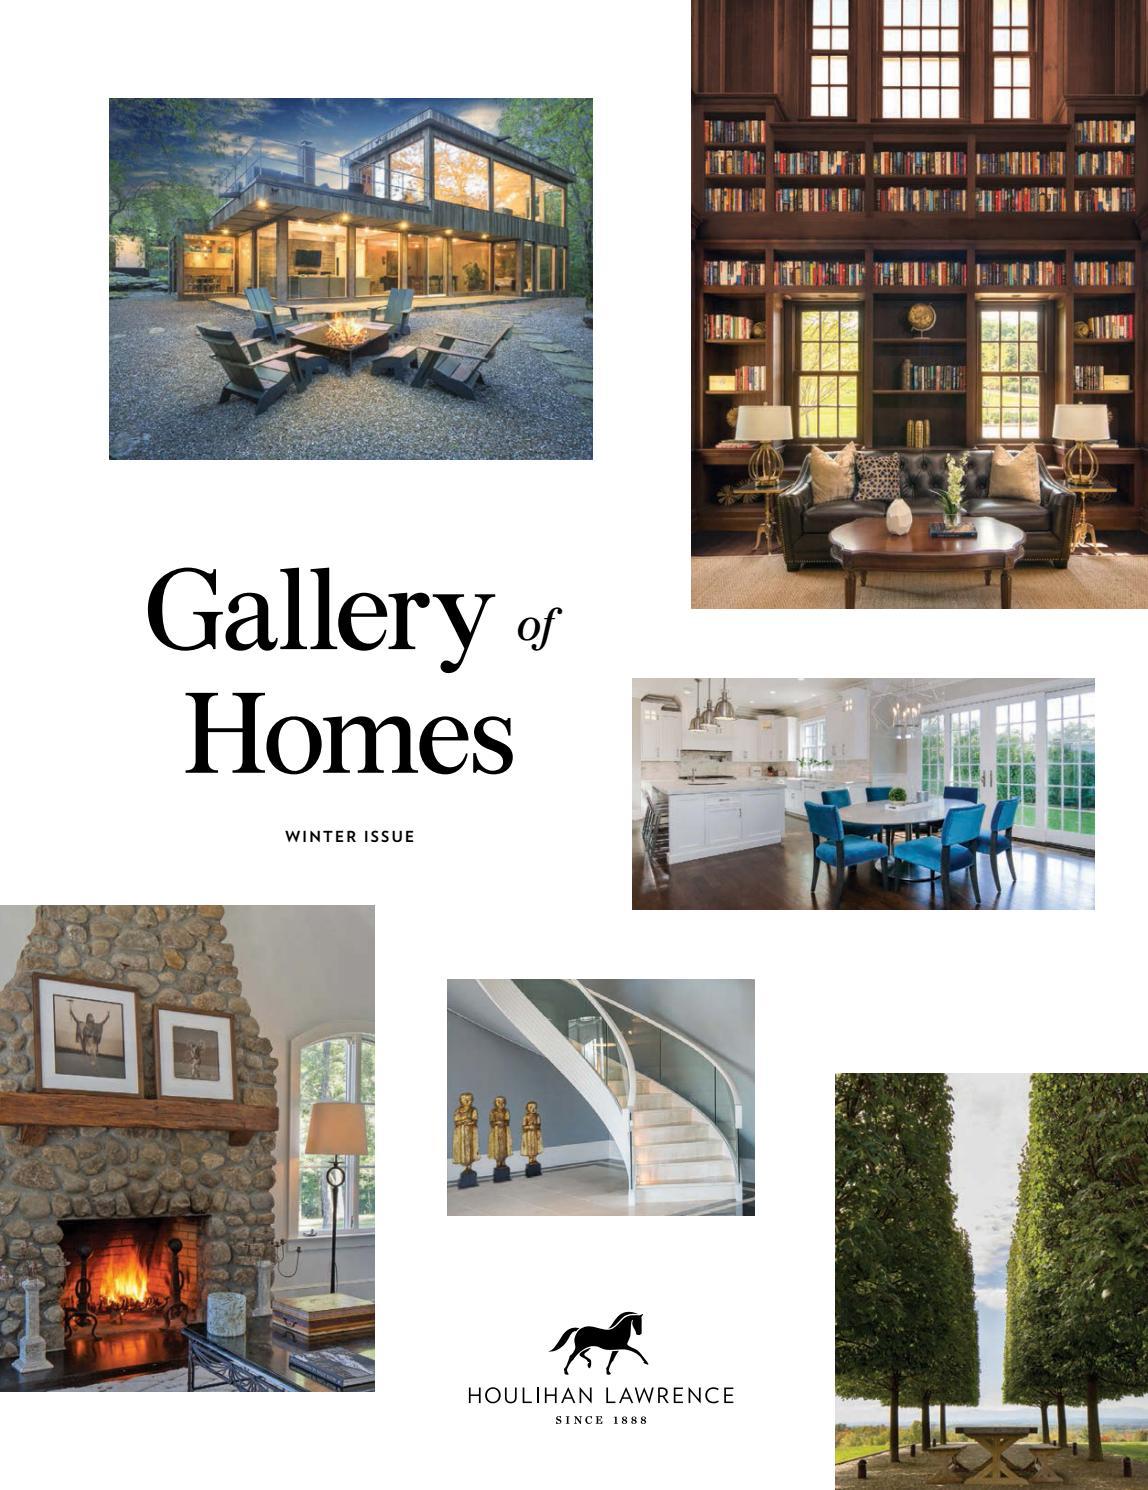 Houlihan lawrence gallery of homes winter 2017 by Houlihan Lawrence ...